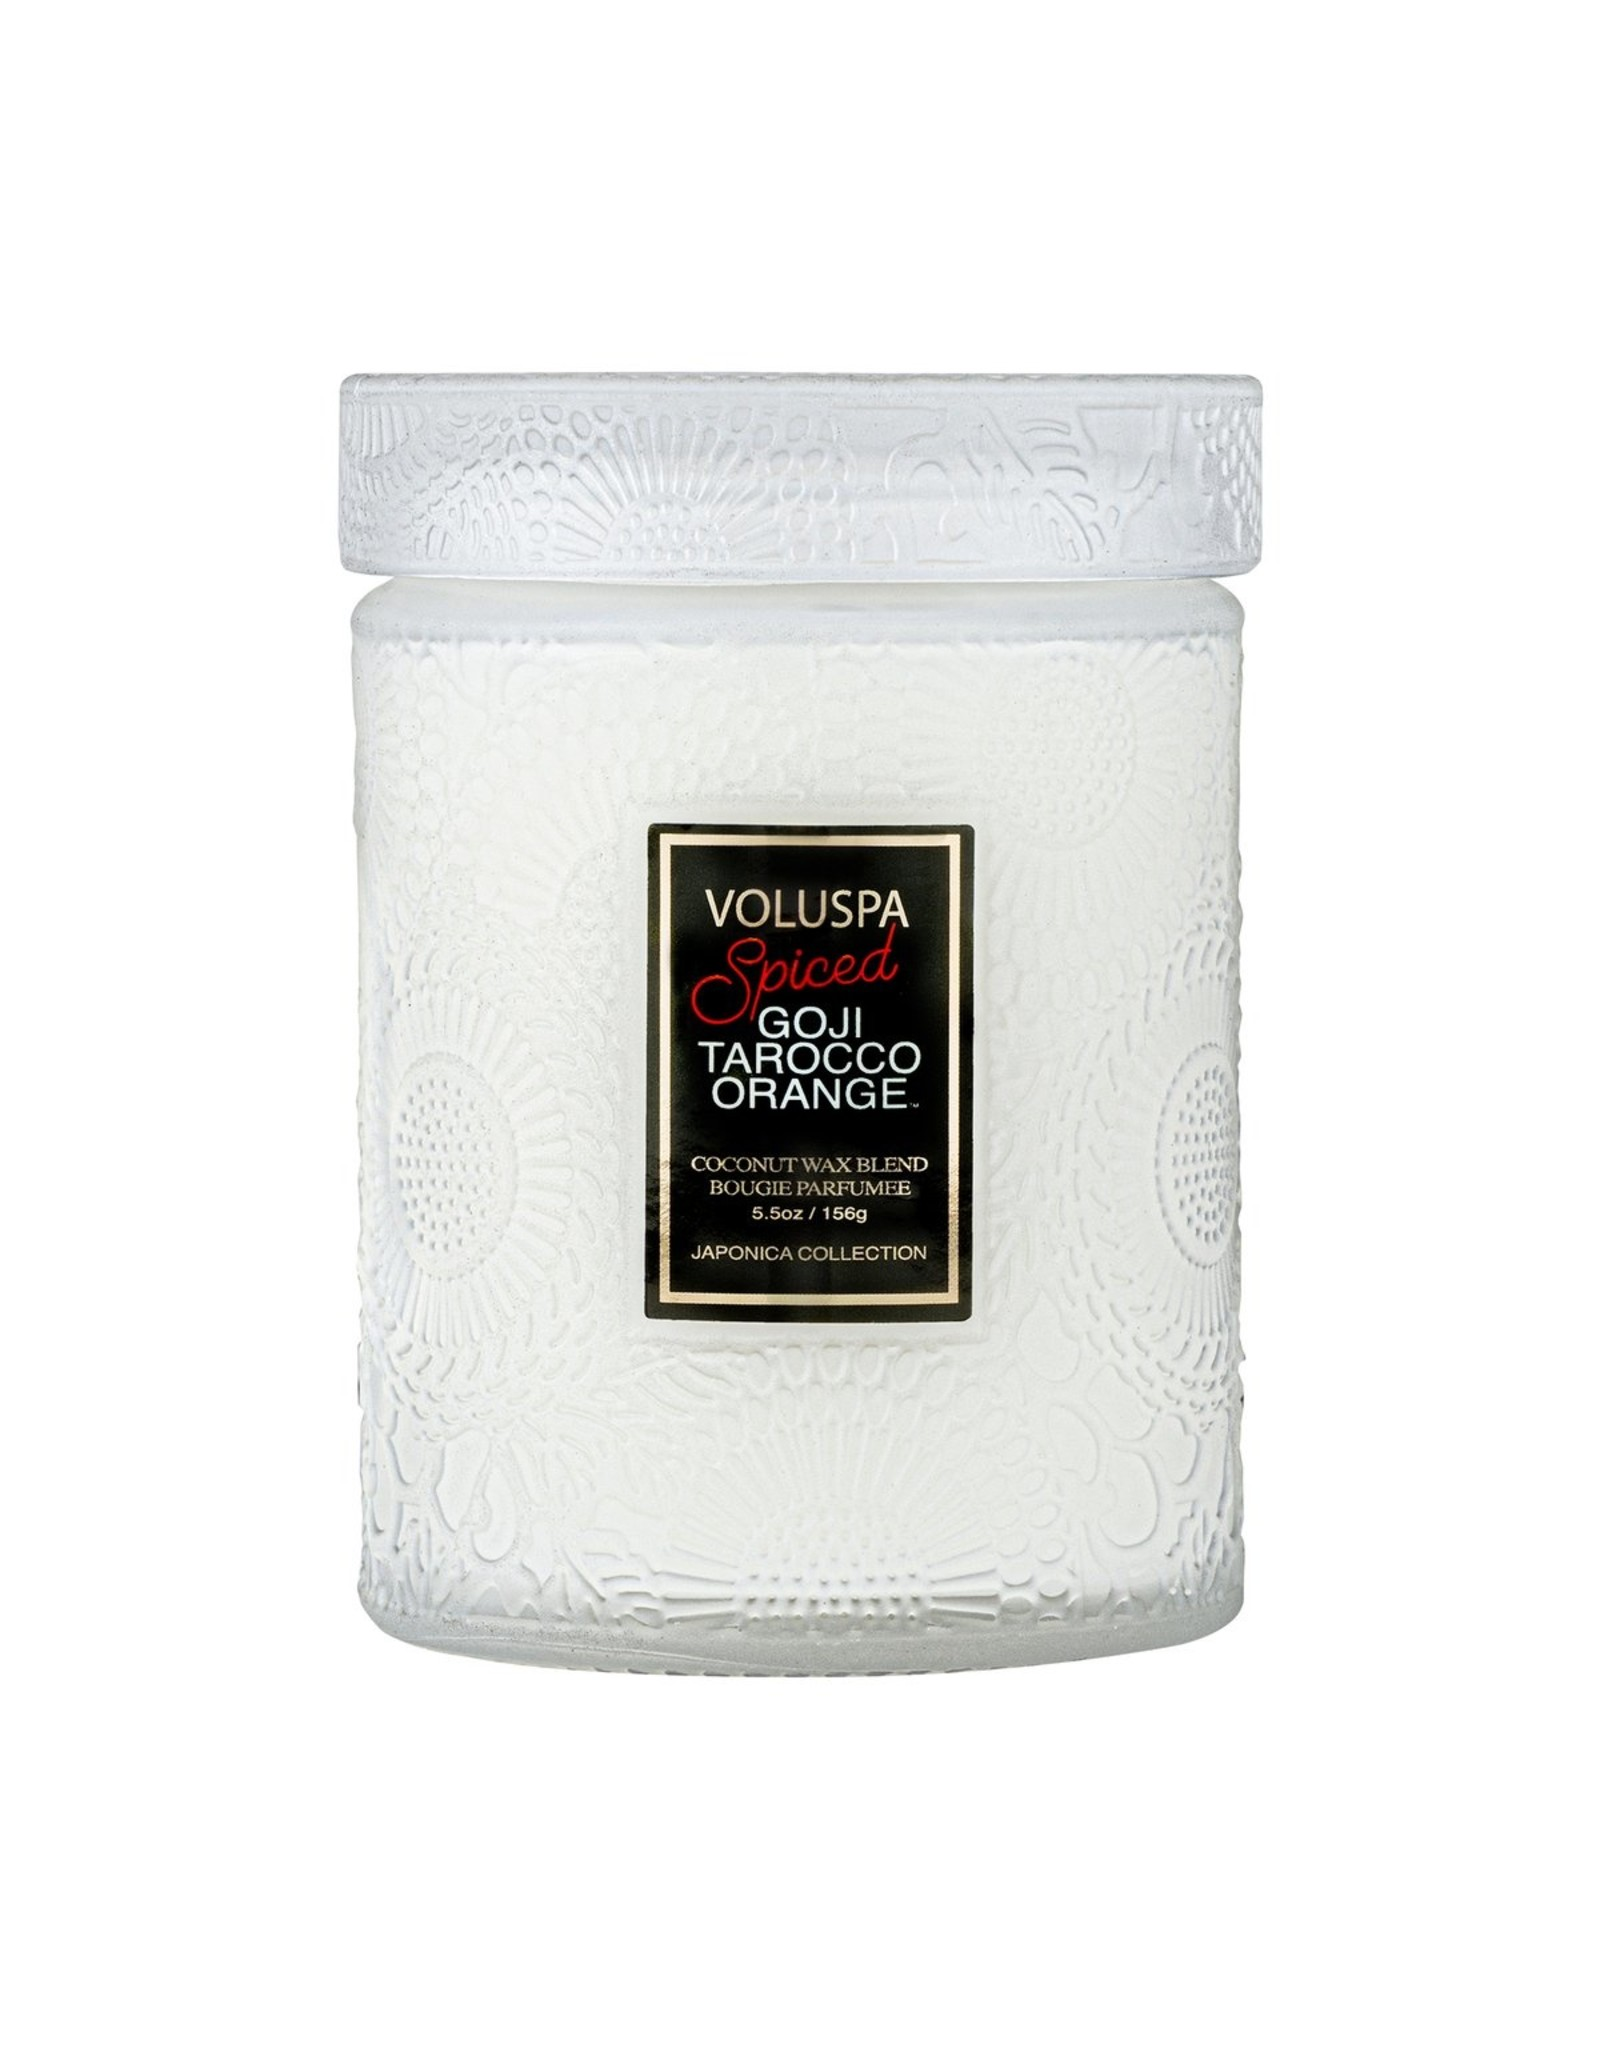 Voluspa Spiced Goji Tarocco Orange - Candle